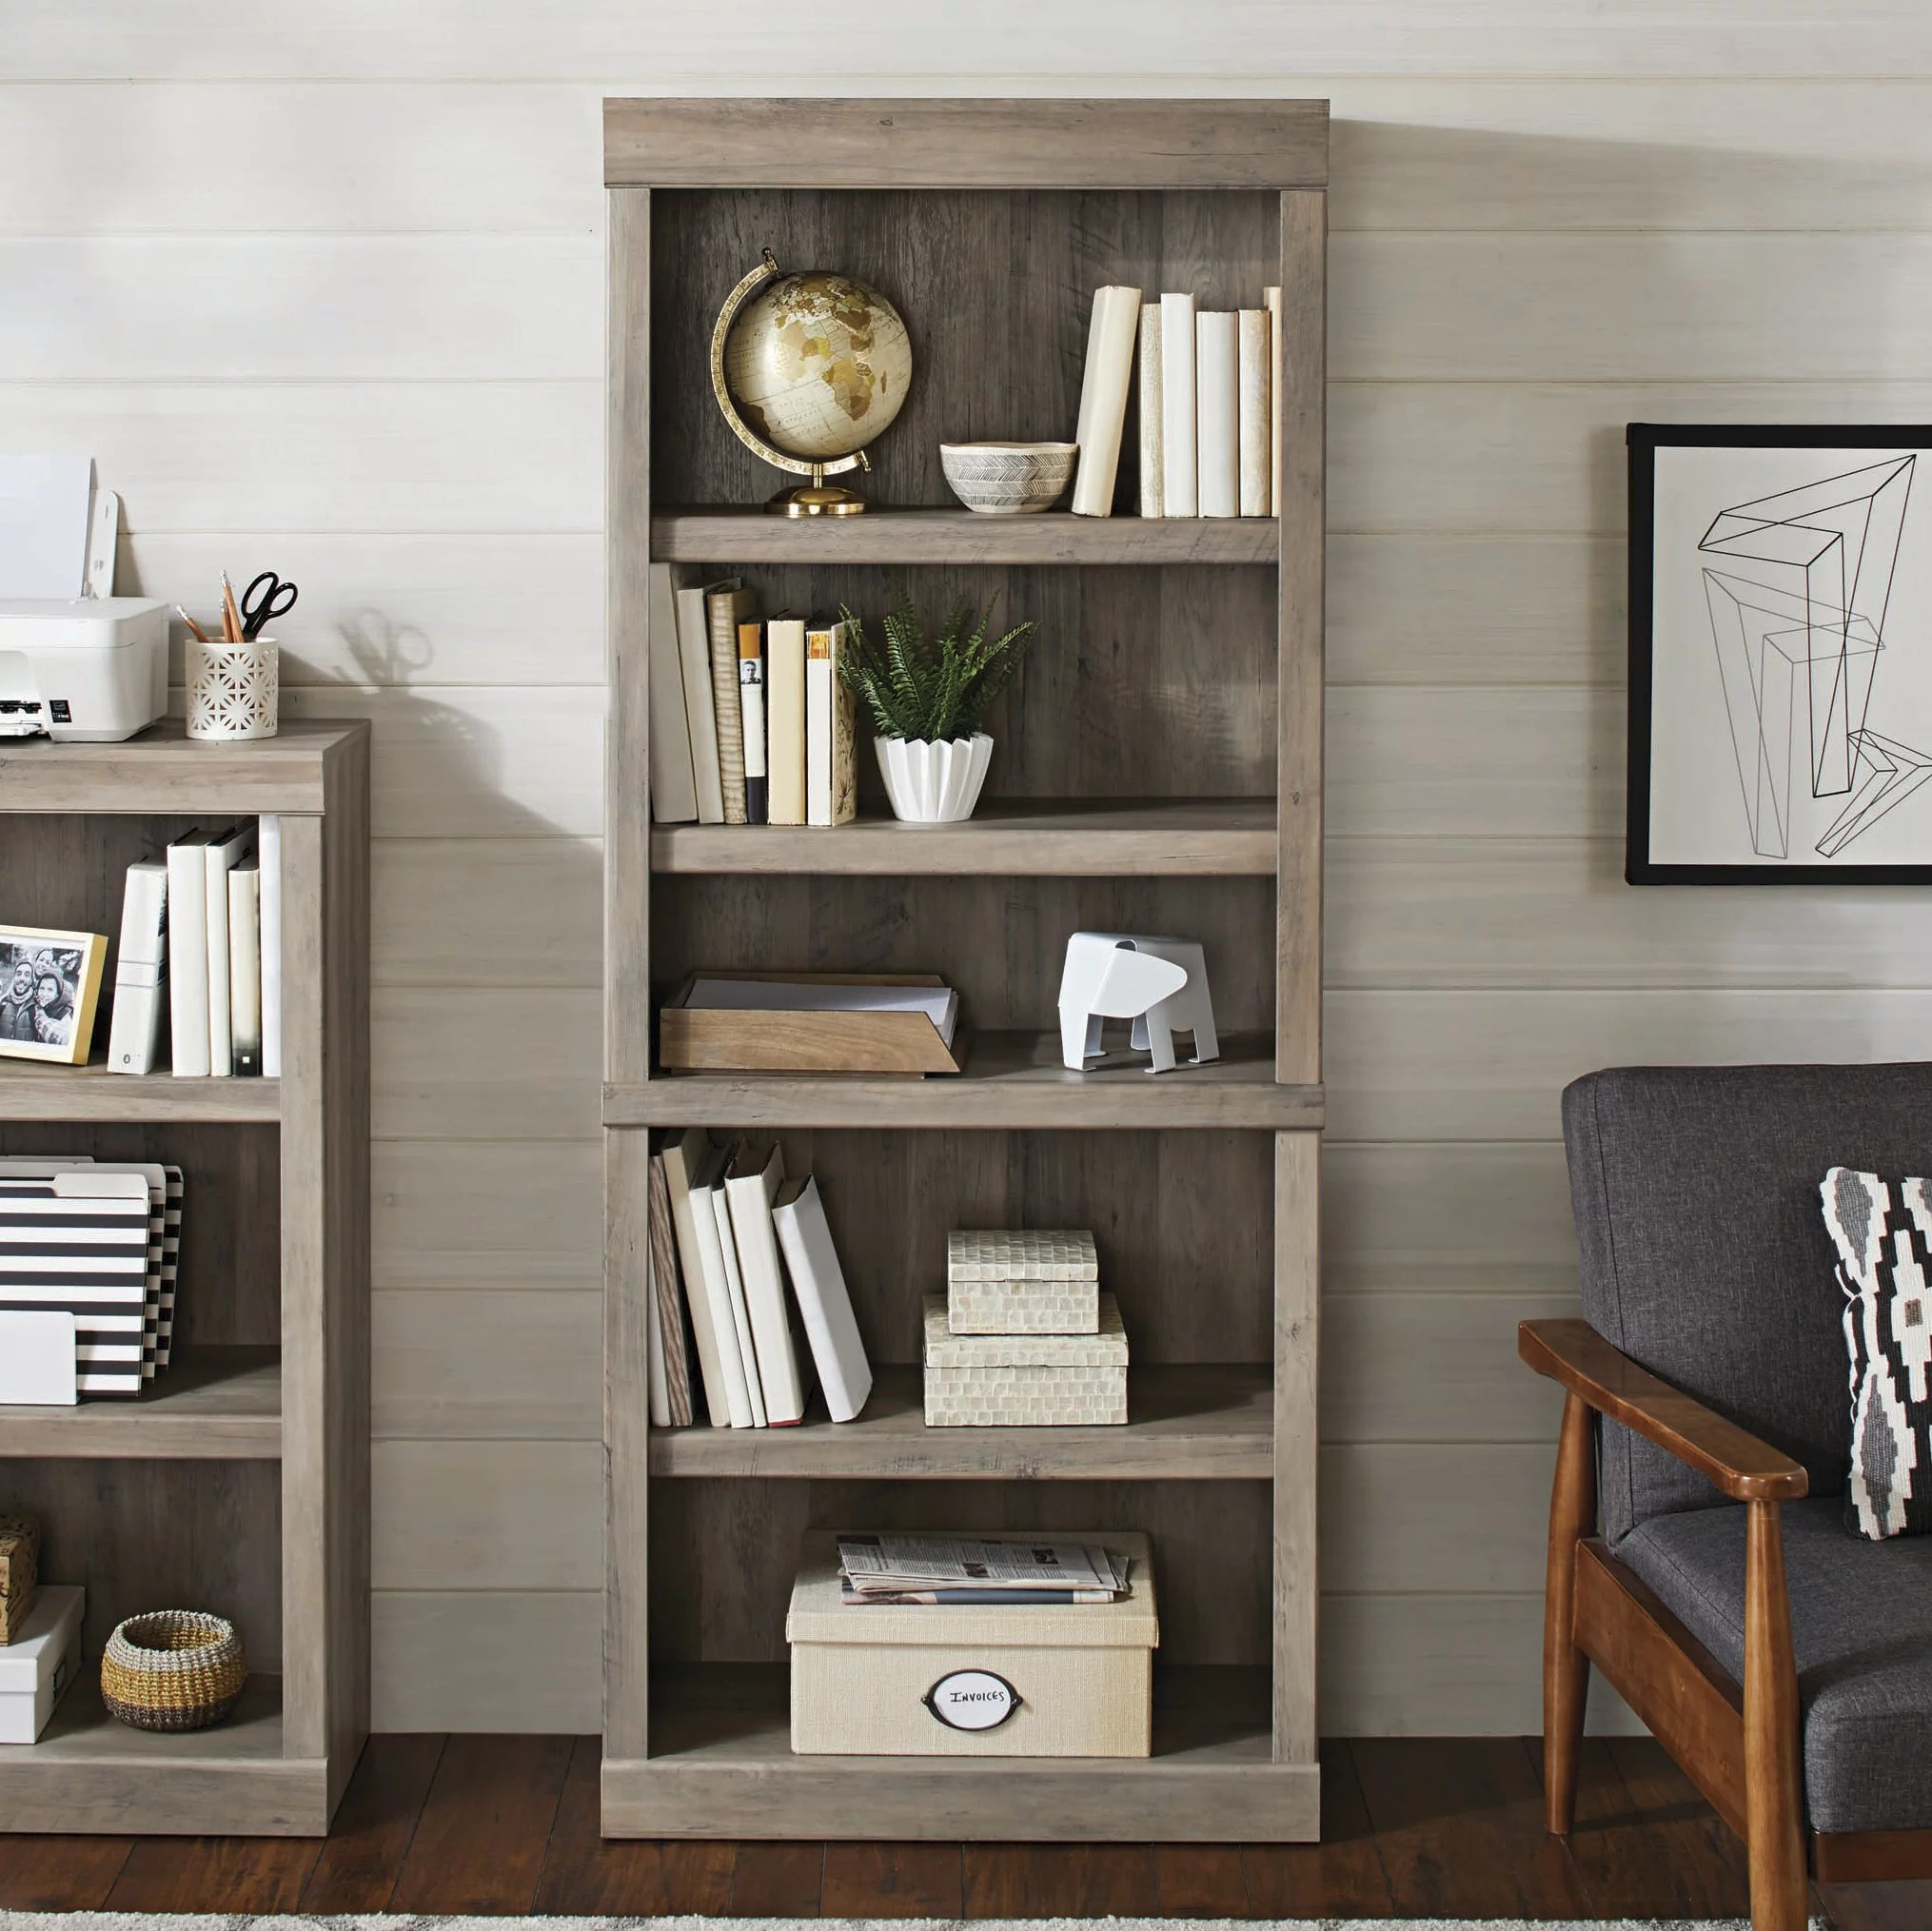 Better Homes Gardens Glendale 5 Shelf Bookcase Rustic Gray Finish Walmart Com Walmart Com